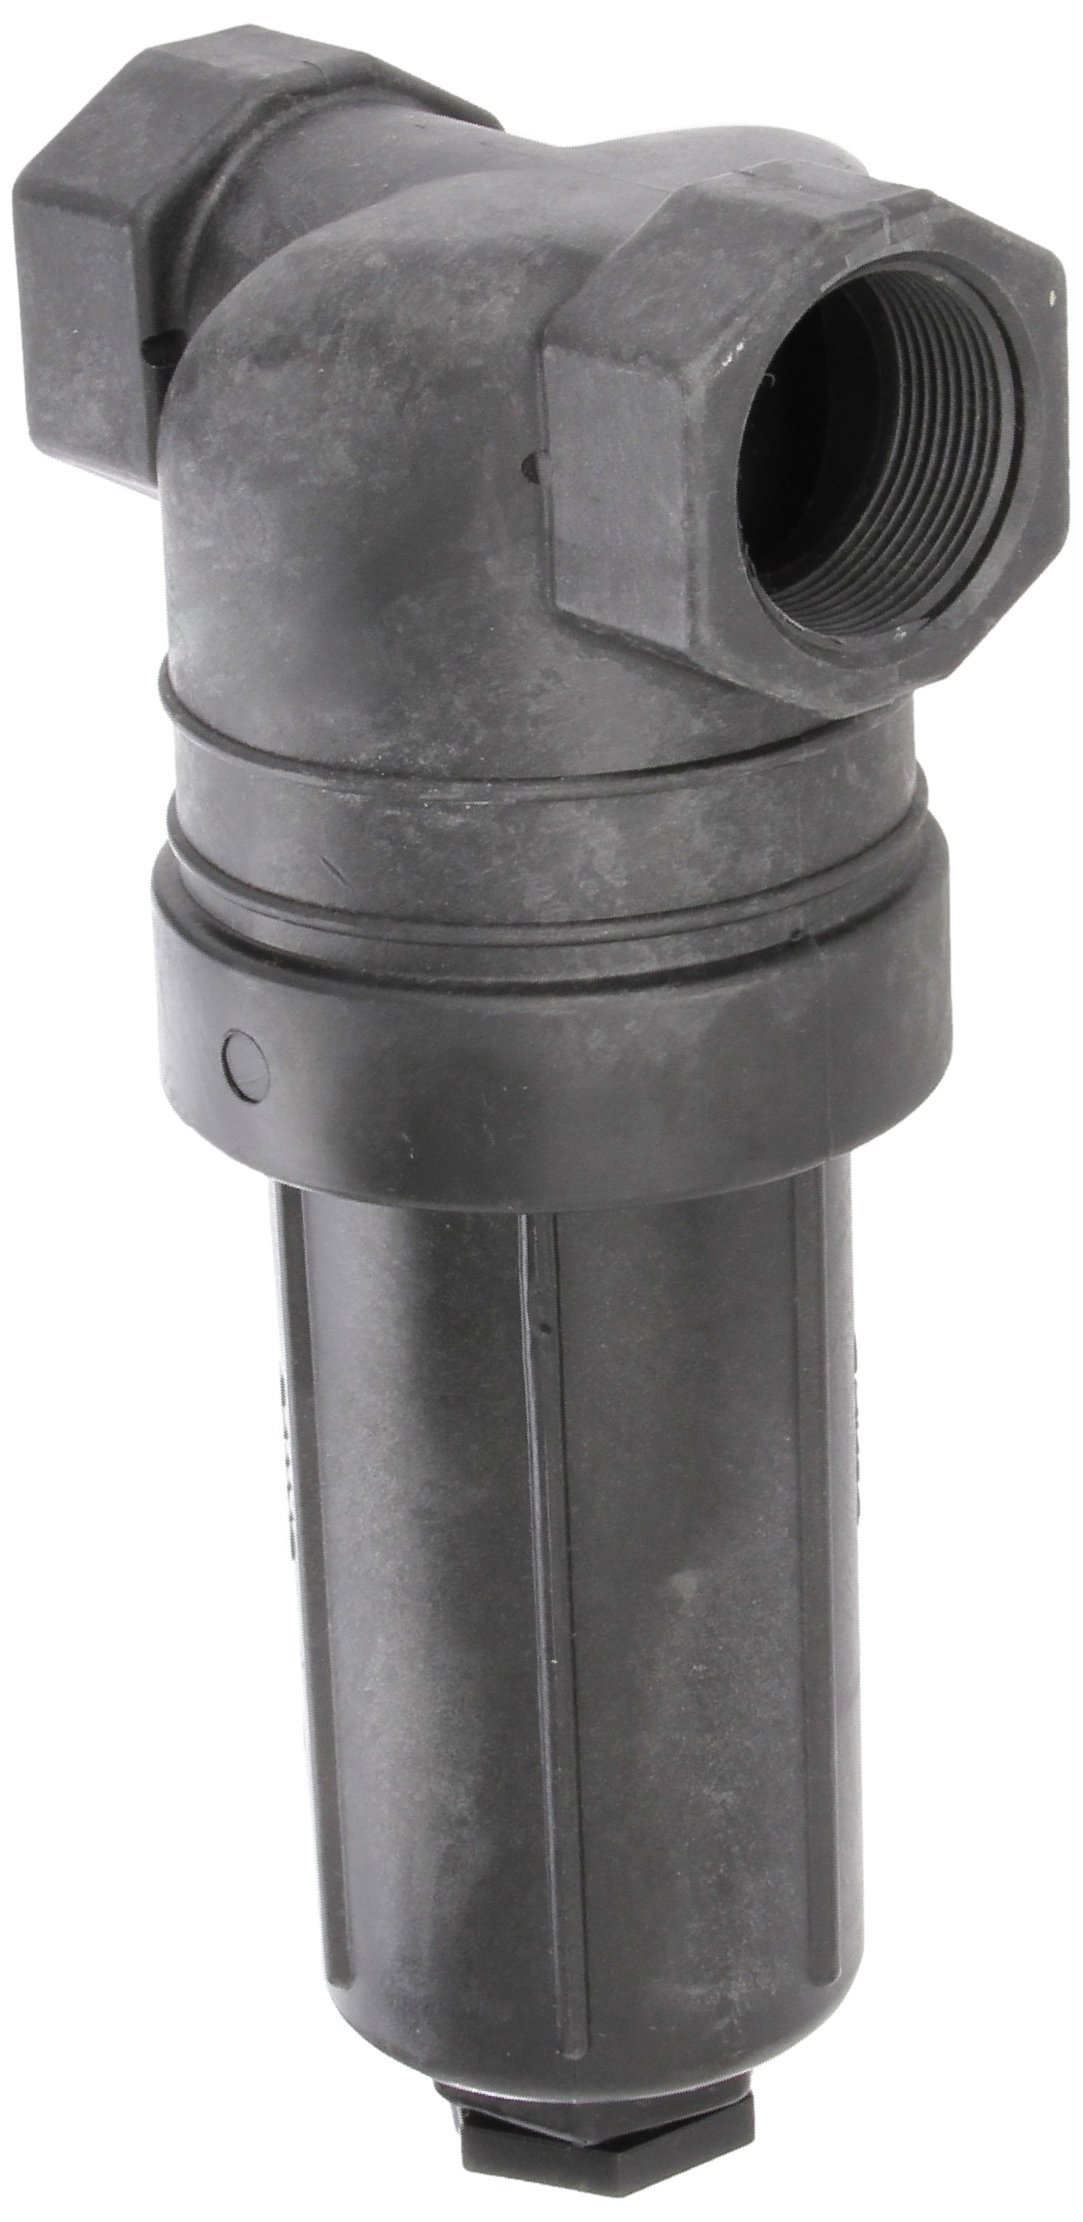 Banjo LST150-80 Polypropylene T-Strainer, 80 Mesh, 1-1/2'' NPT Female by Banjo Corp